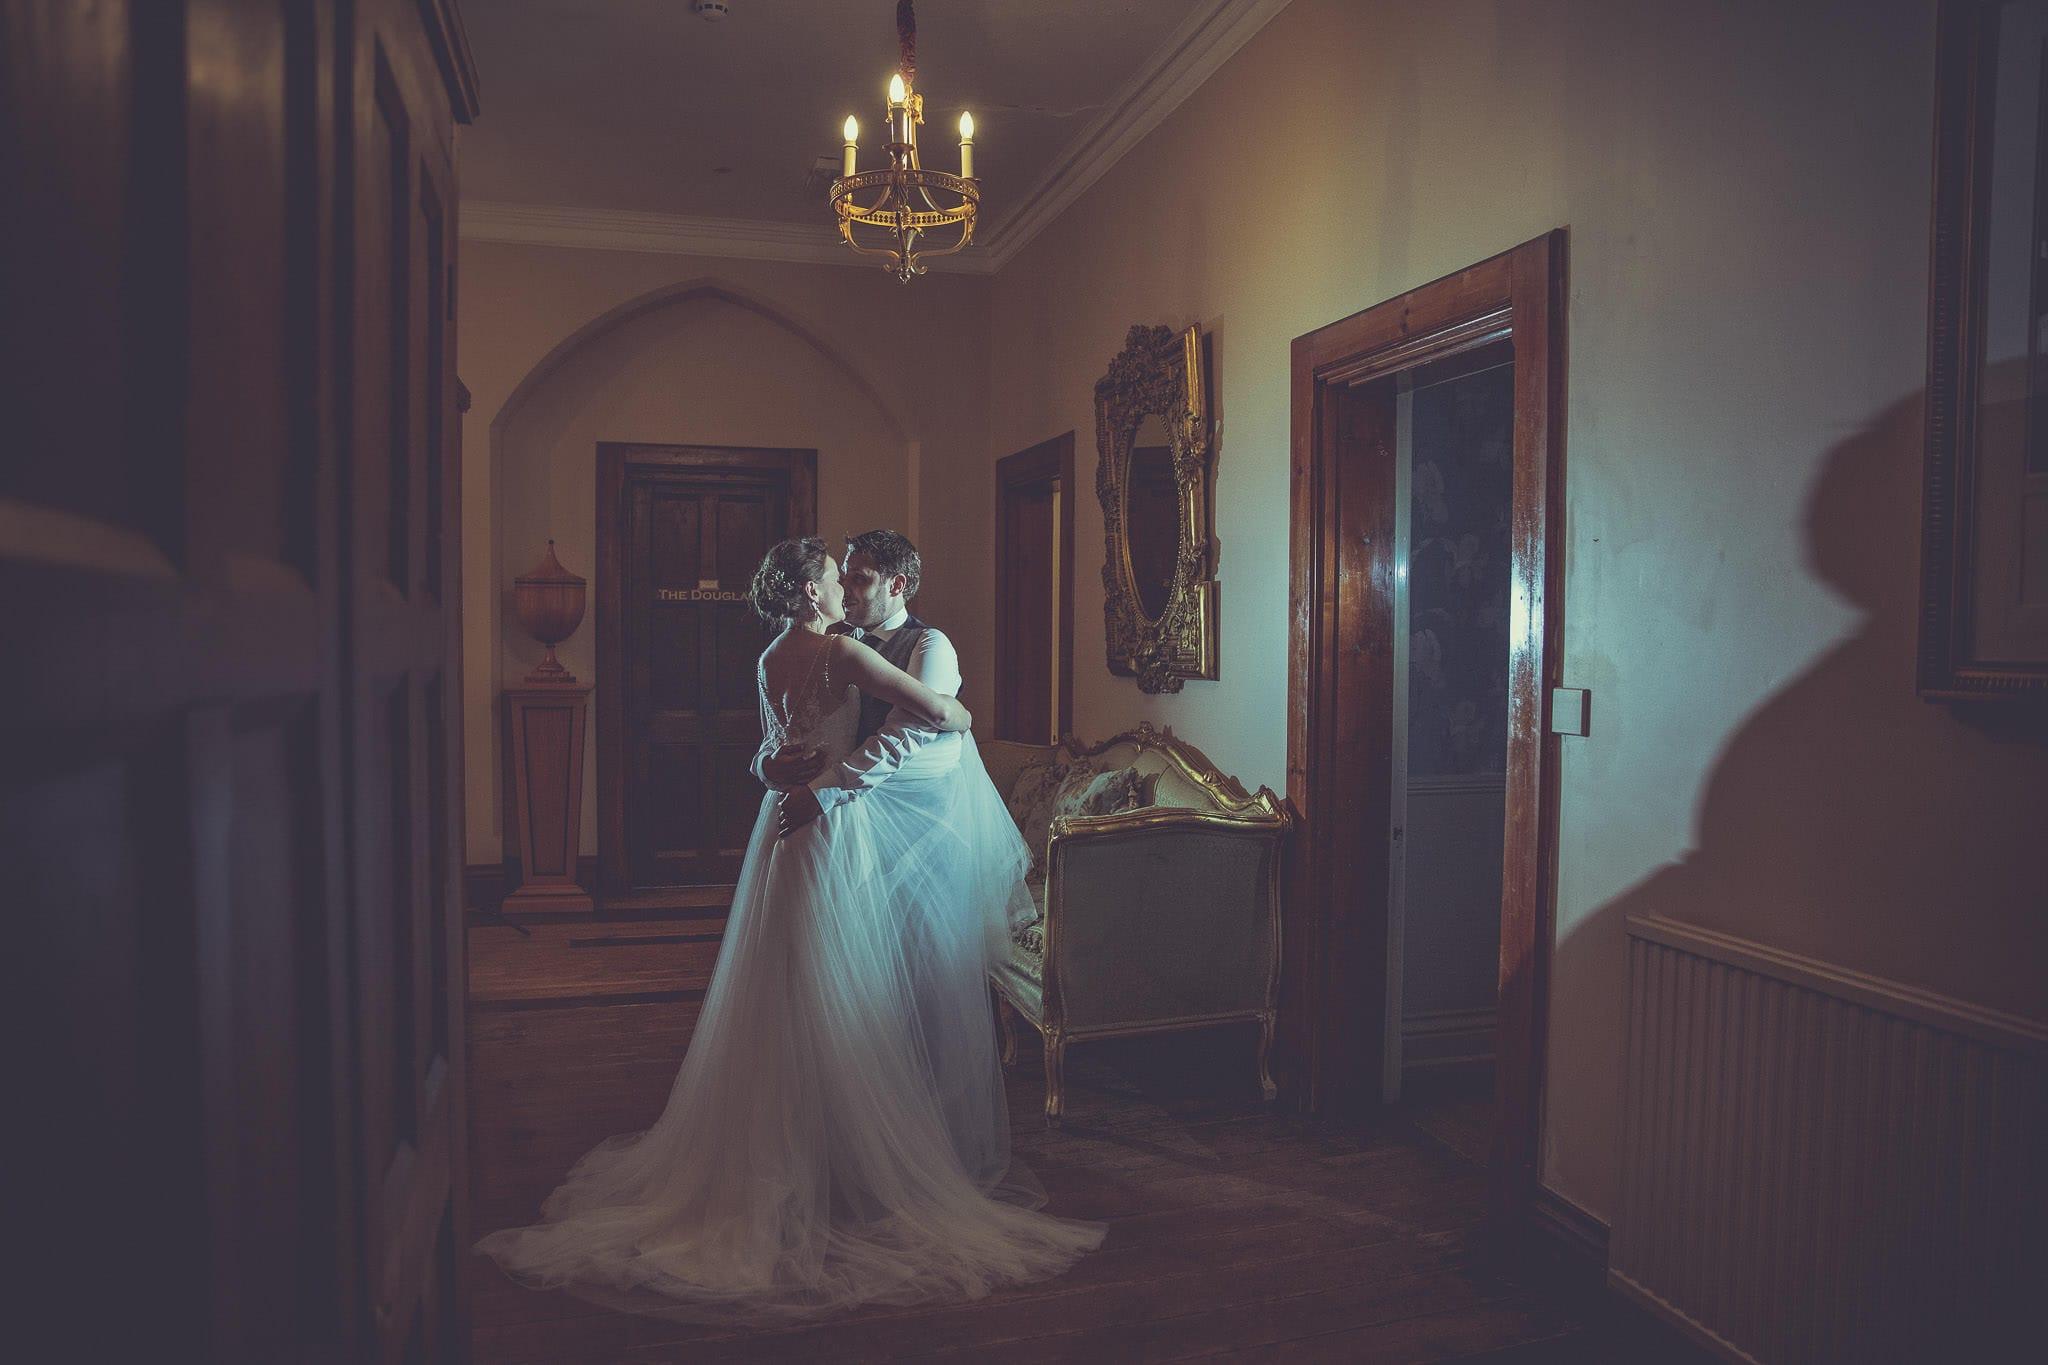 Huntsham-Court-Wedding-Photography-1257-of-267-Bobbie-Lee-Photography-Bridgend-Photographer